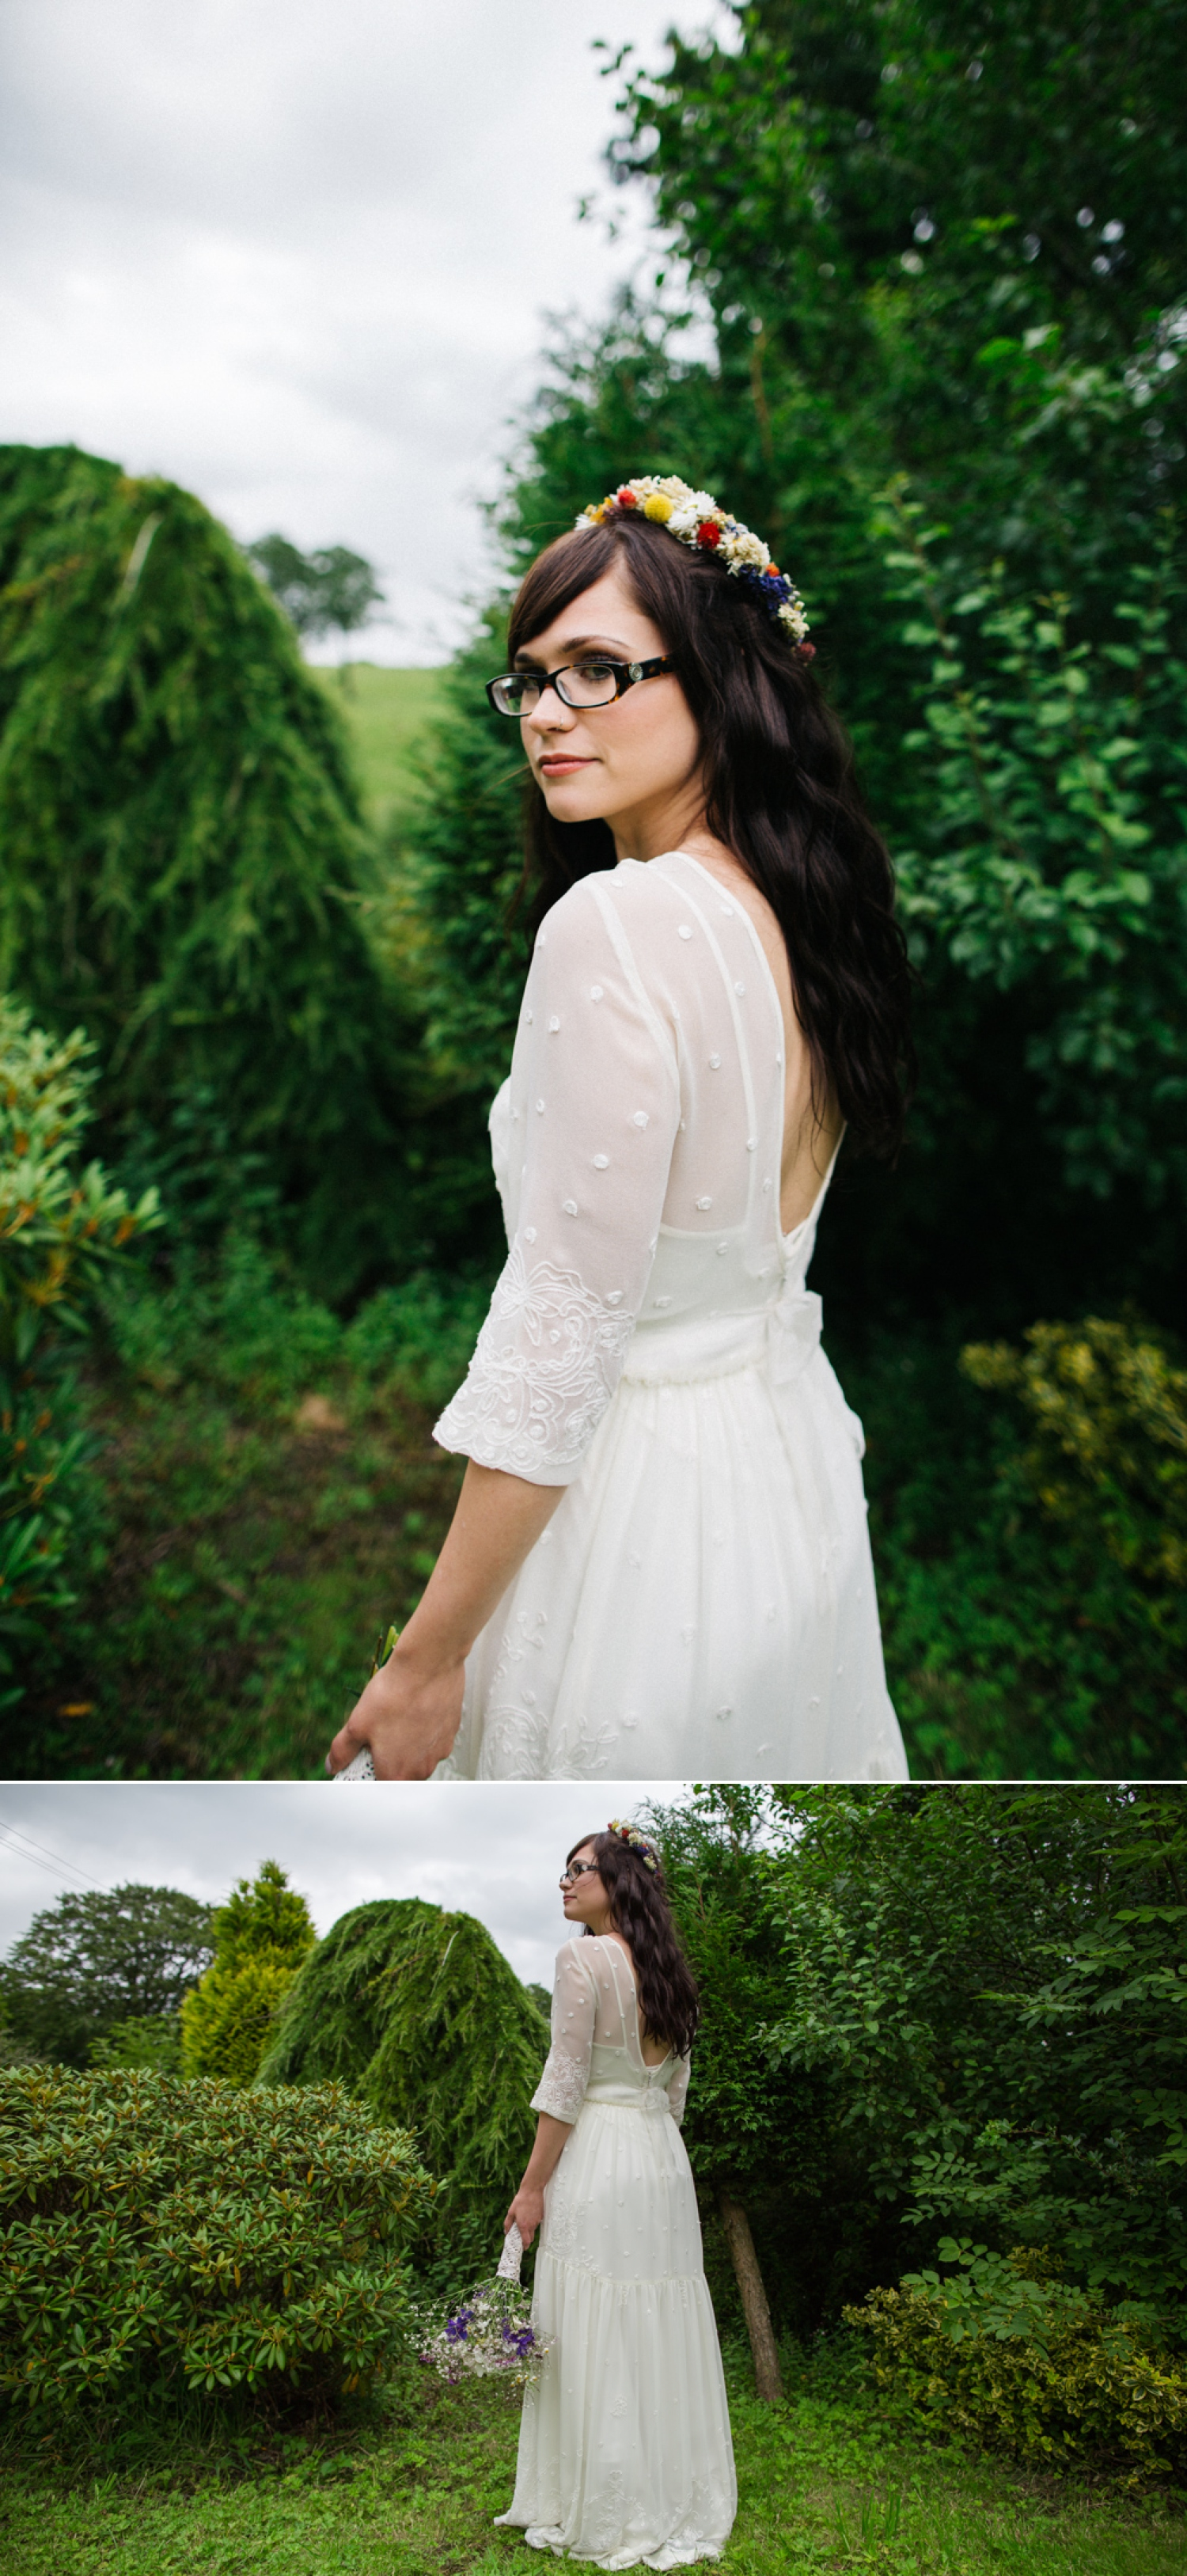 Somerset Wedding Photographer Elly & Liam 11